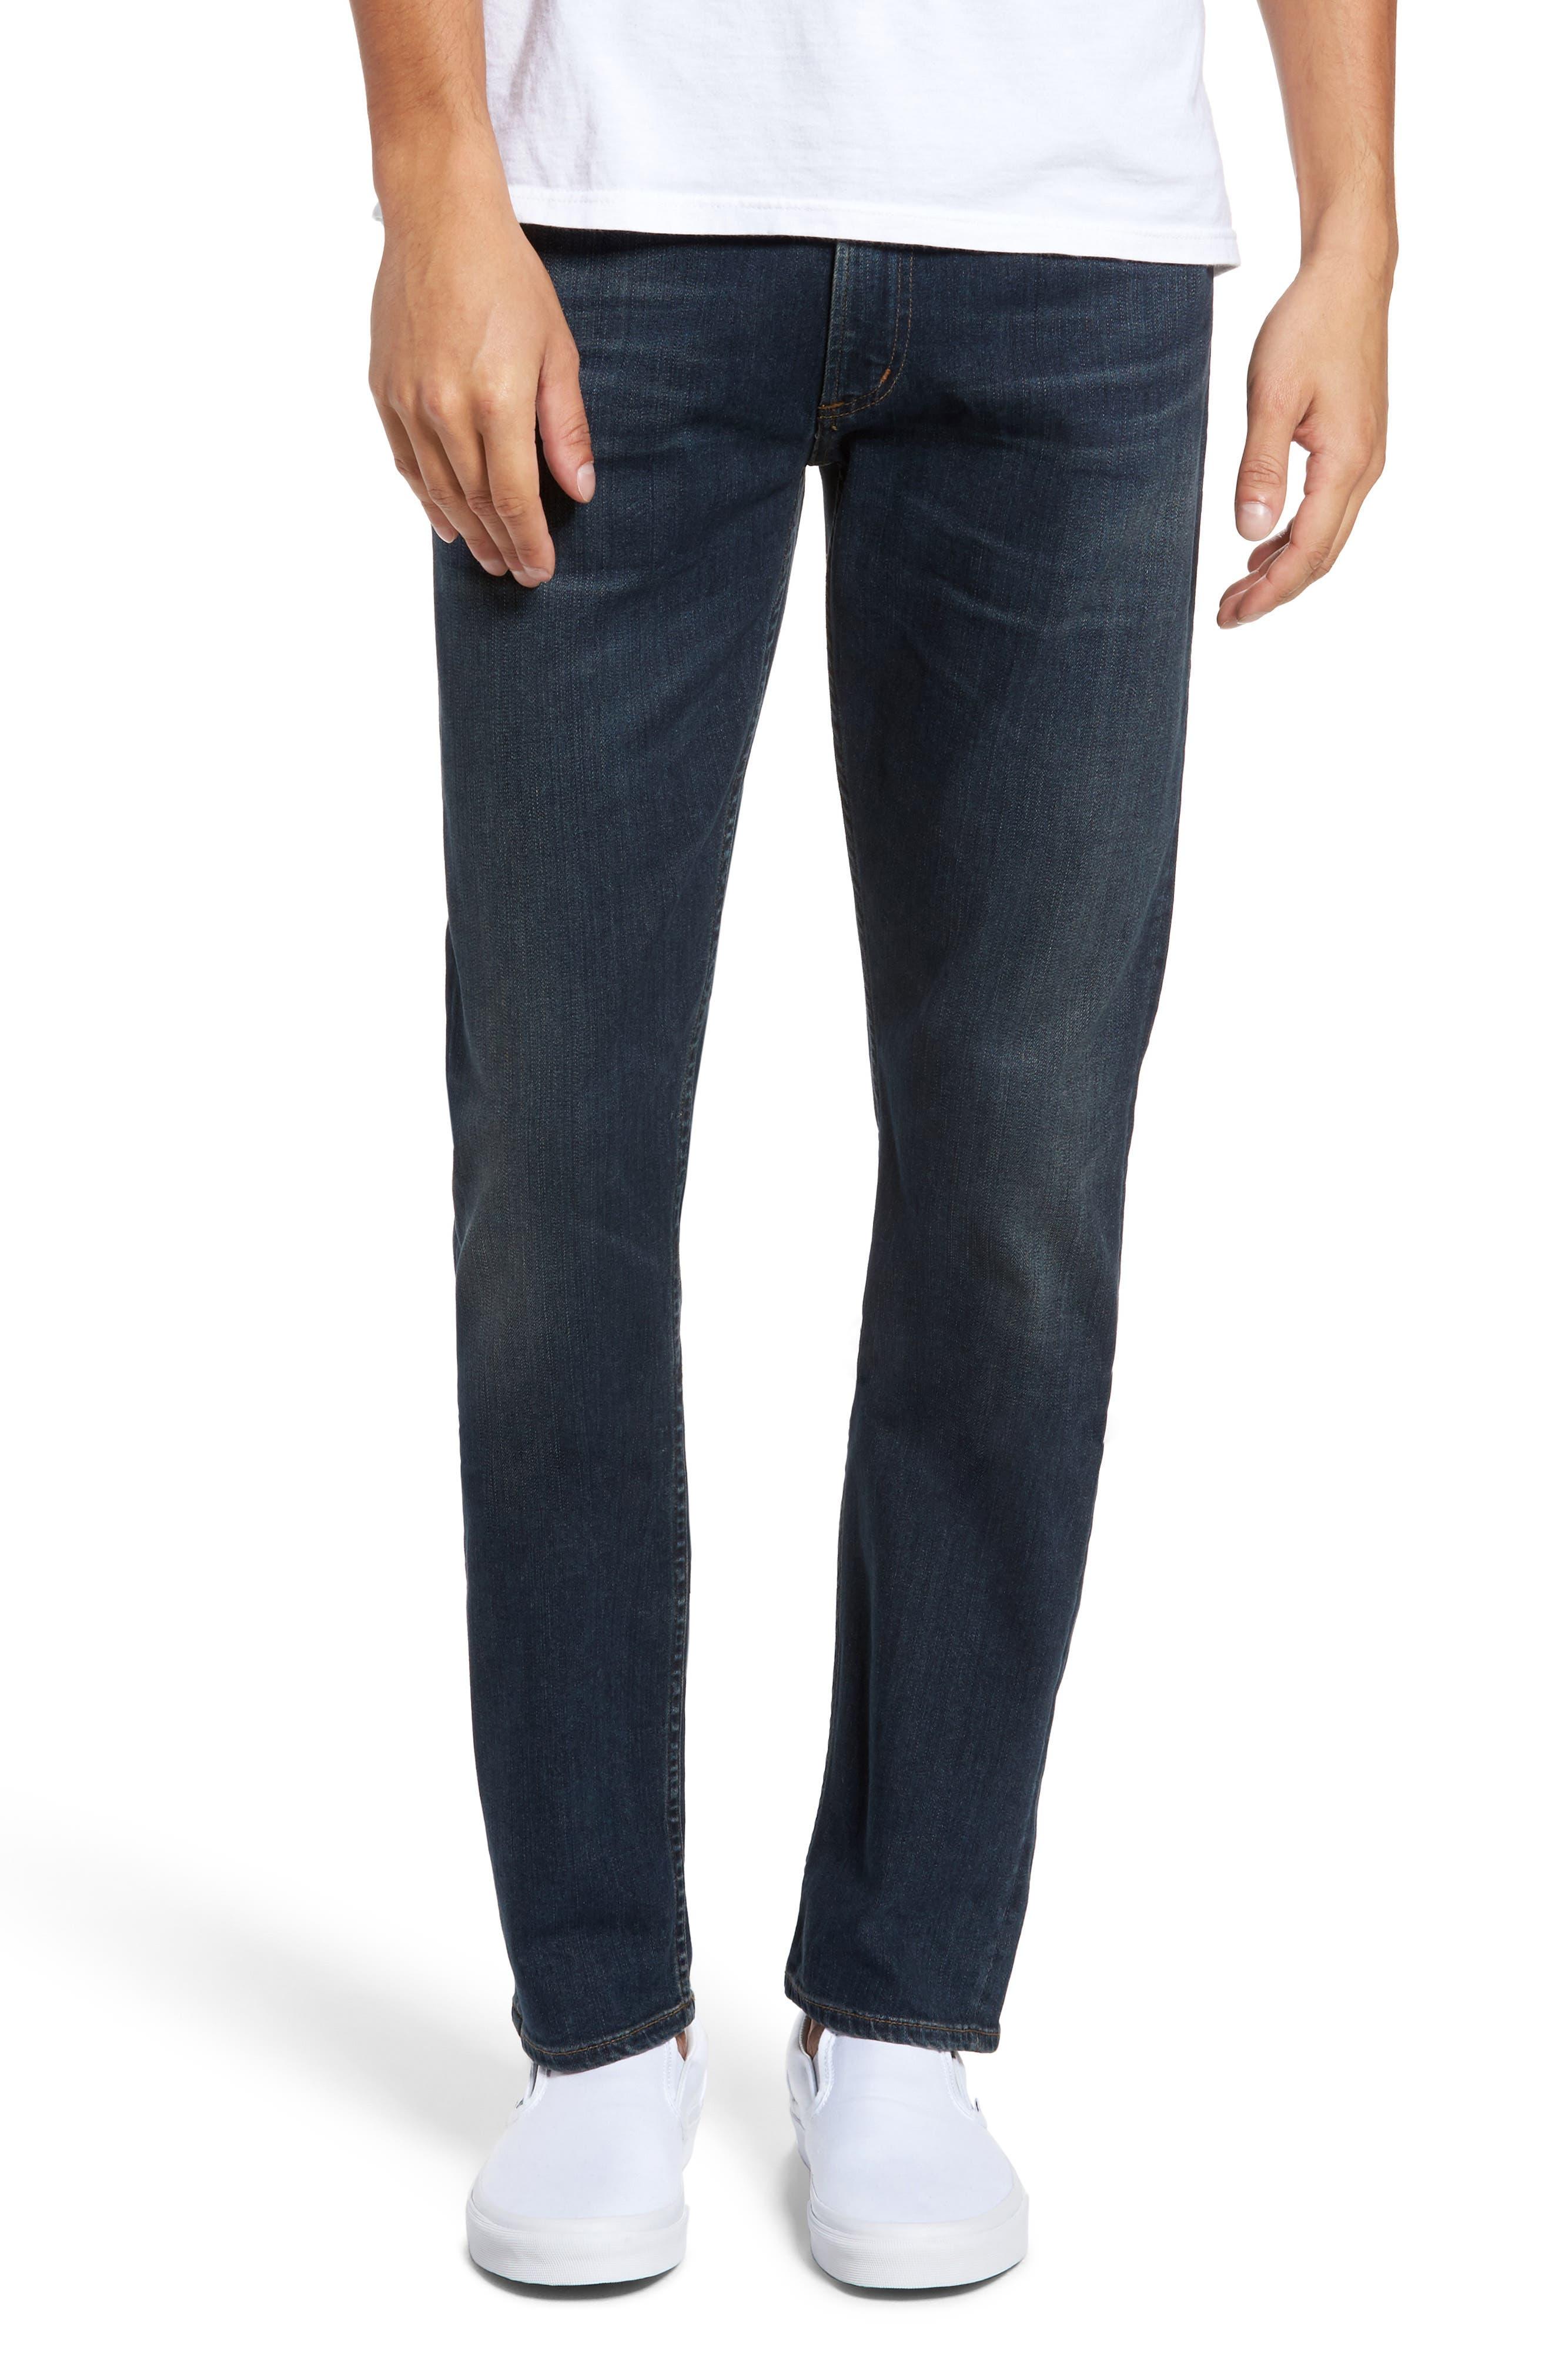 PERFORM - Bowery Slim Fit Jeans,                         Main,                         color, Kingman